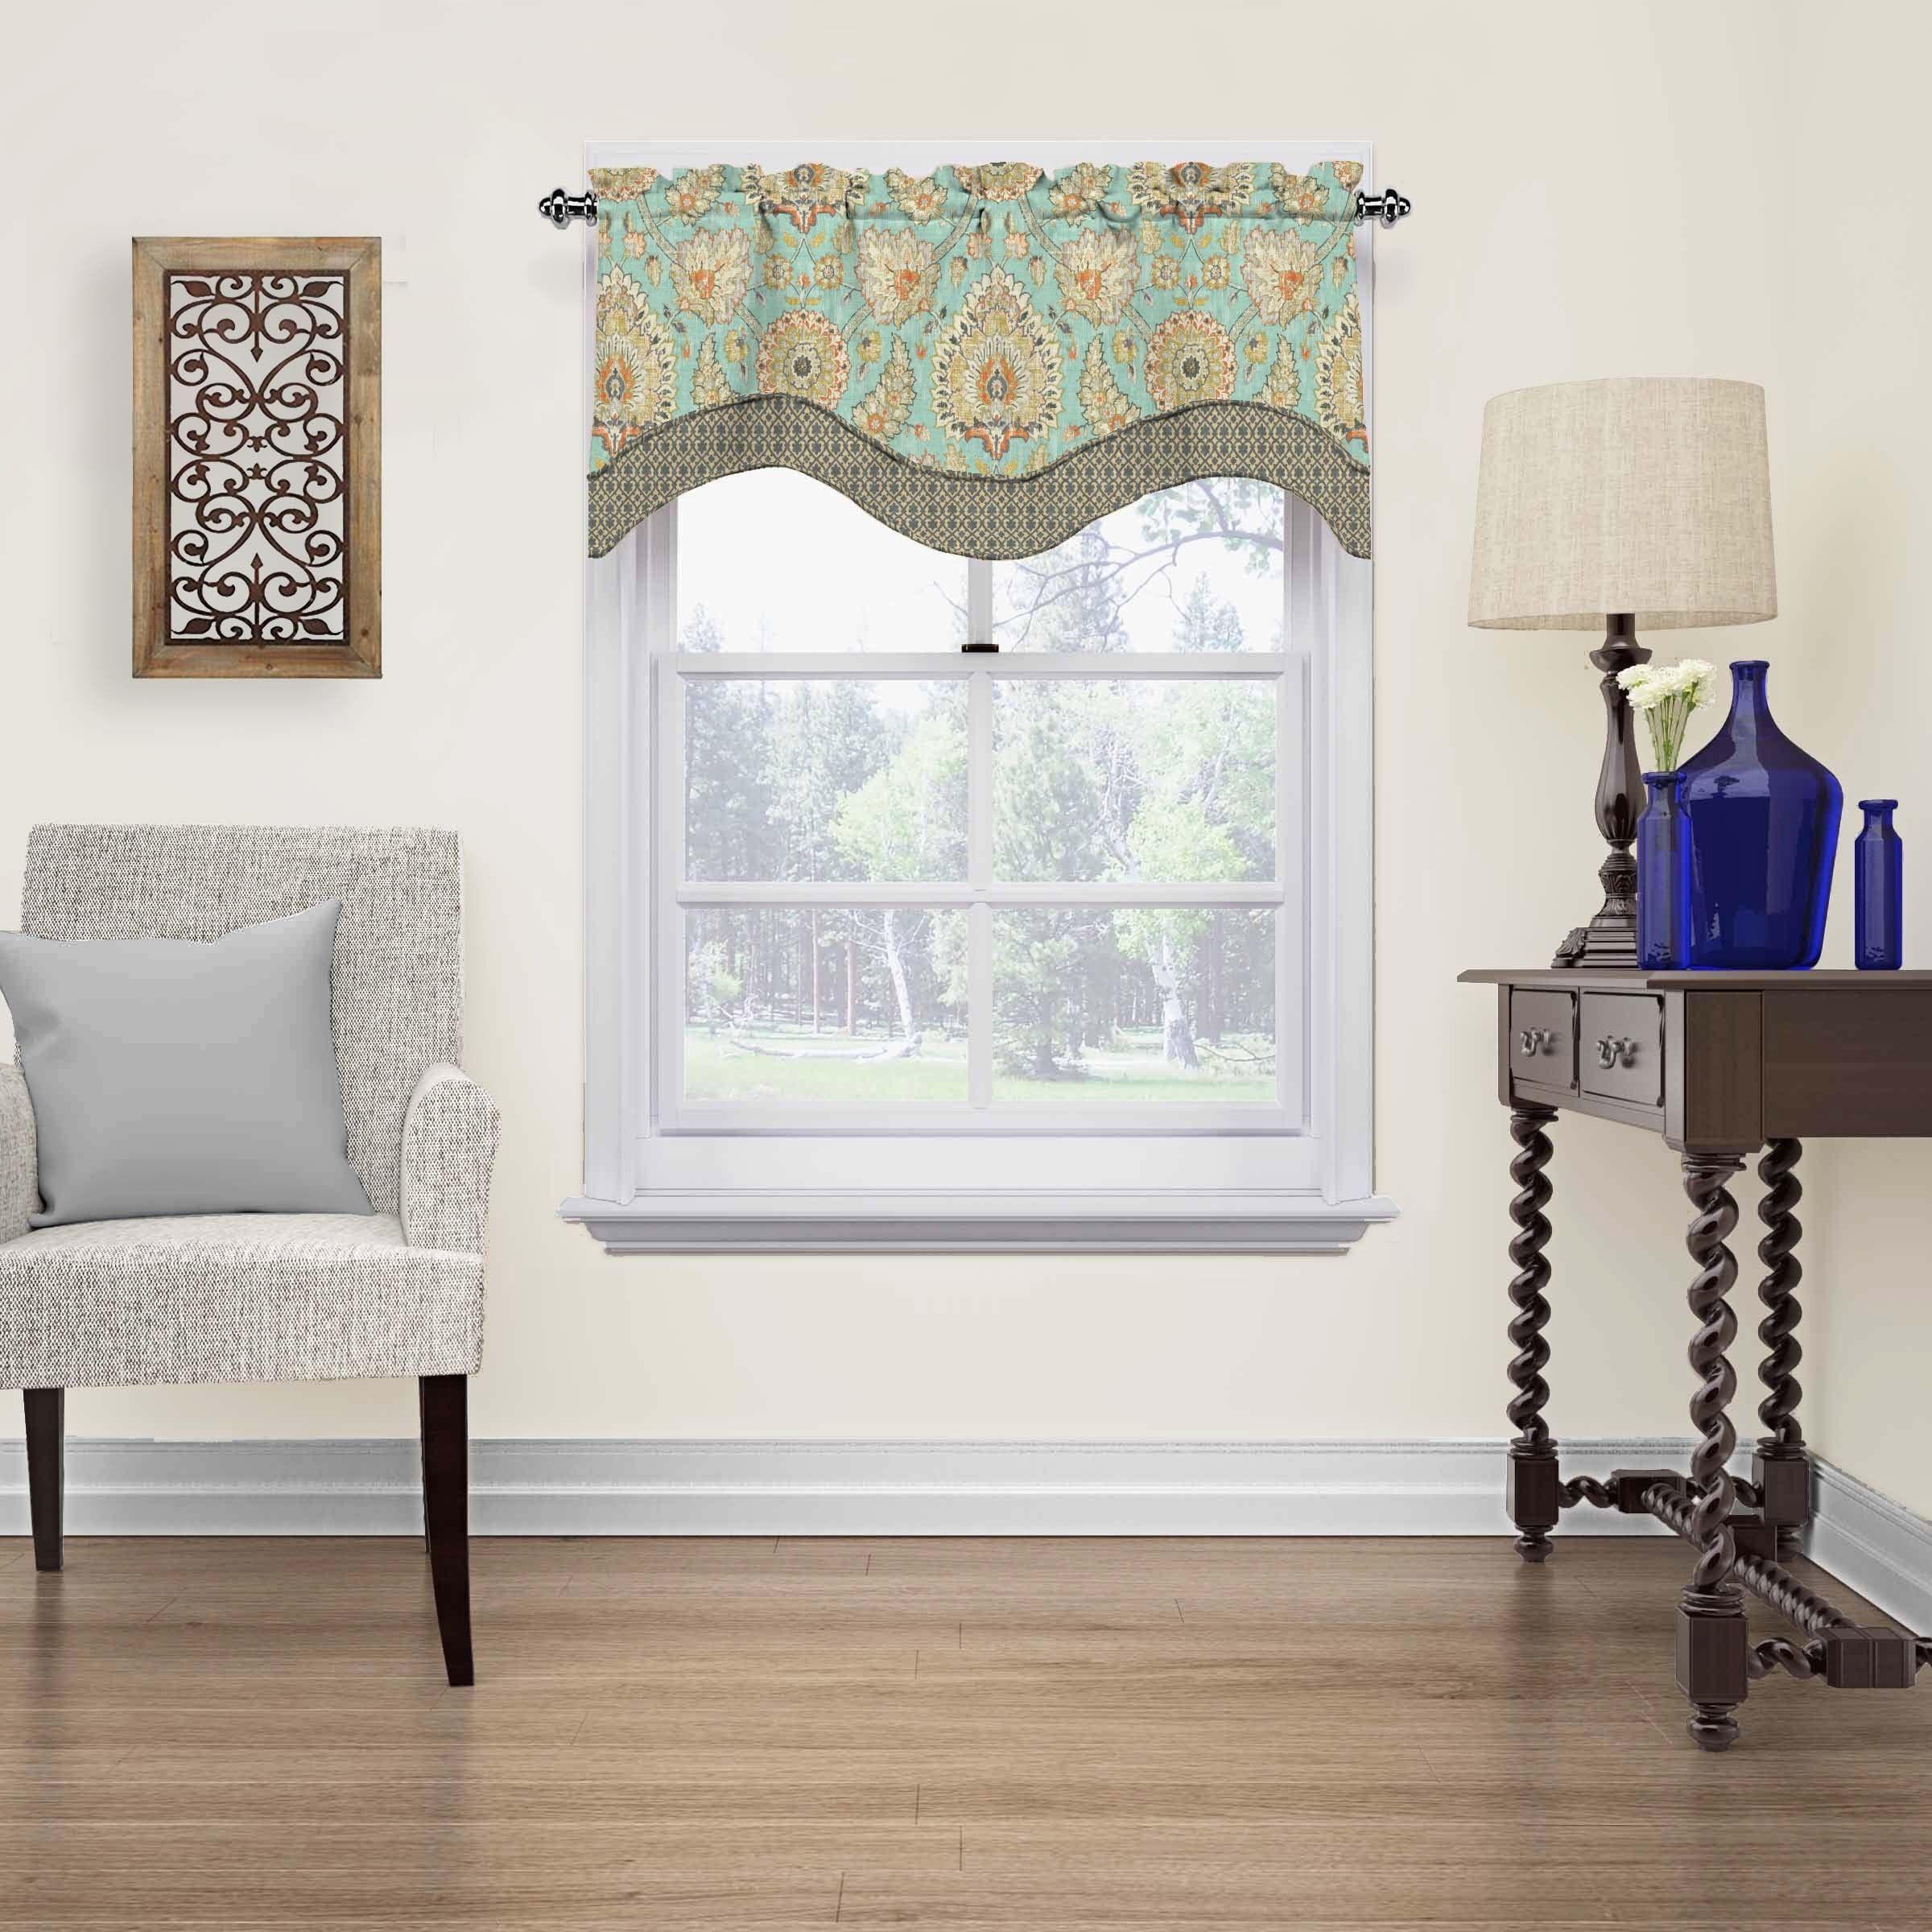 Waverly Clifton Hall Scalloped Window Valance (52x18 - Opal), Multi ...